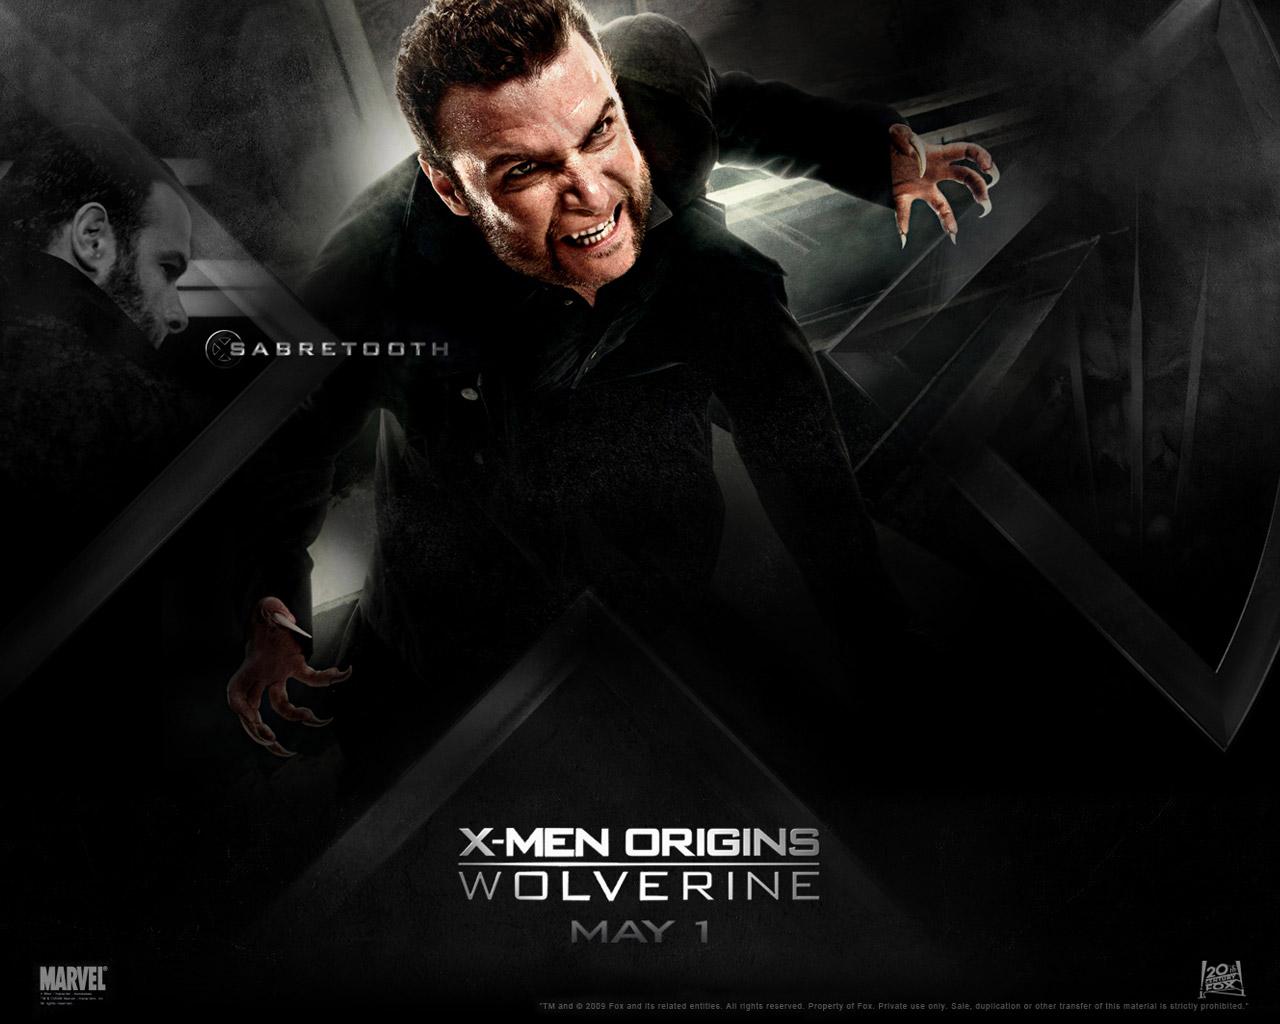 http://3.bp.blogspot.com/-G-g4vmhuLco/T9C3qV57fyI/AAAAAAAAQCI/hekyaLv_-x8/s1600/Movies_Films_X_X-Men_Origins__Wolverine__2009_015095_.jpg